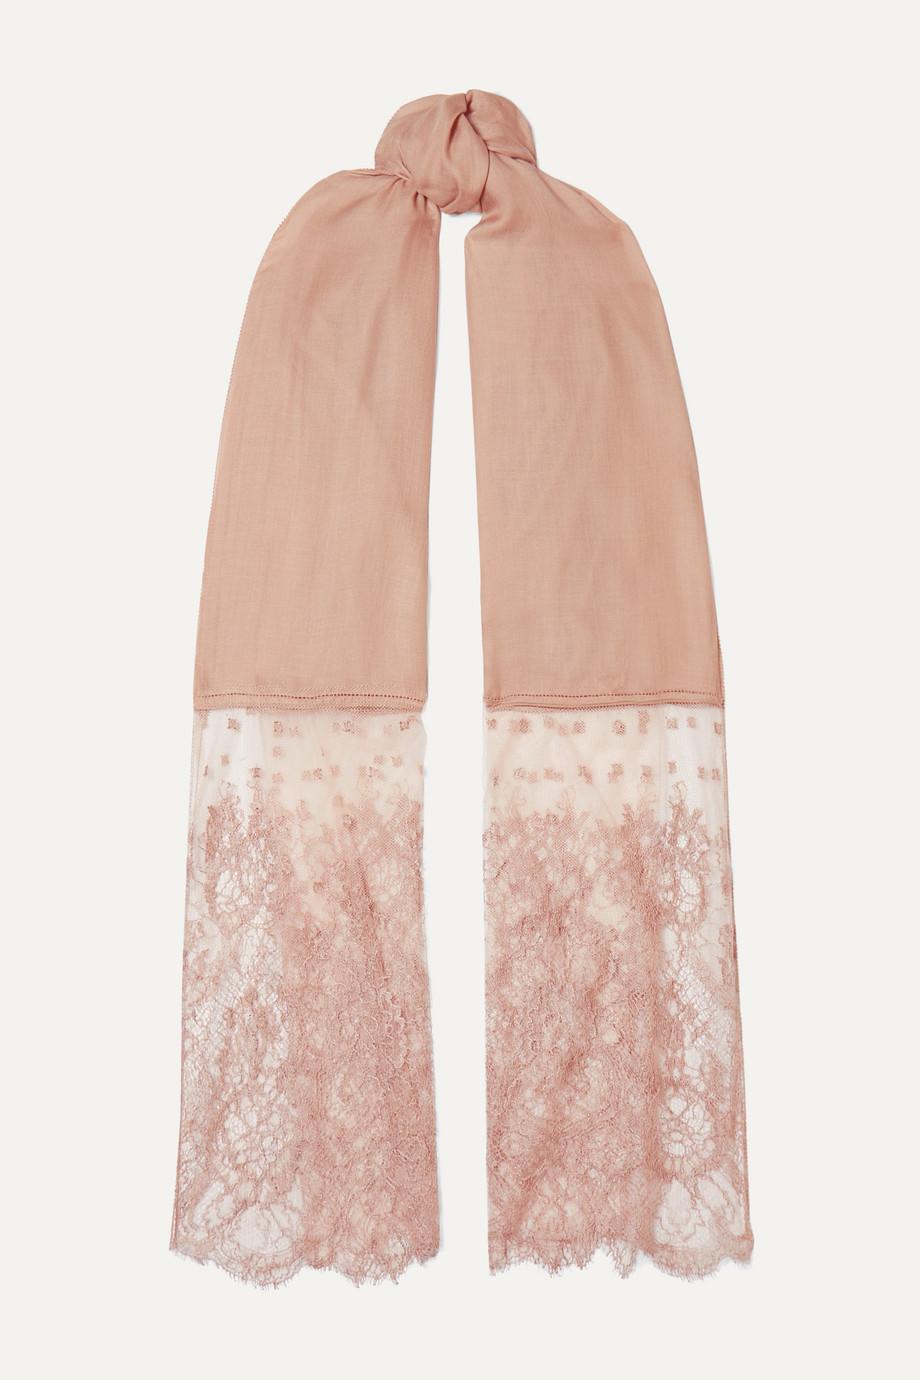 Valentino Valentino Garavani lace-paneled modal and cashmere-blend scarf